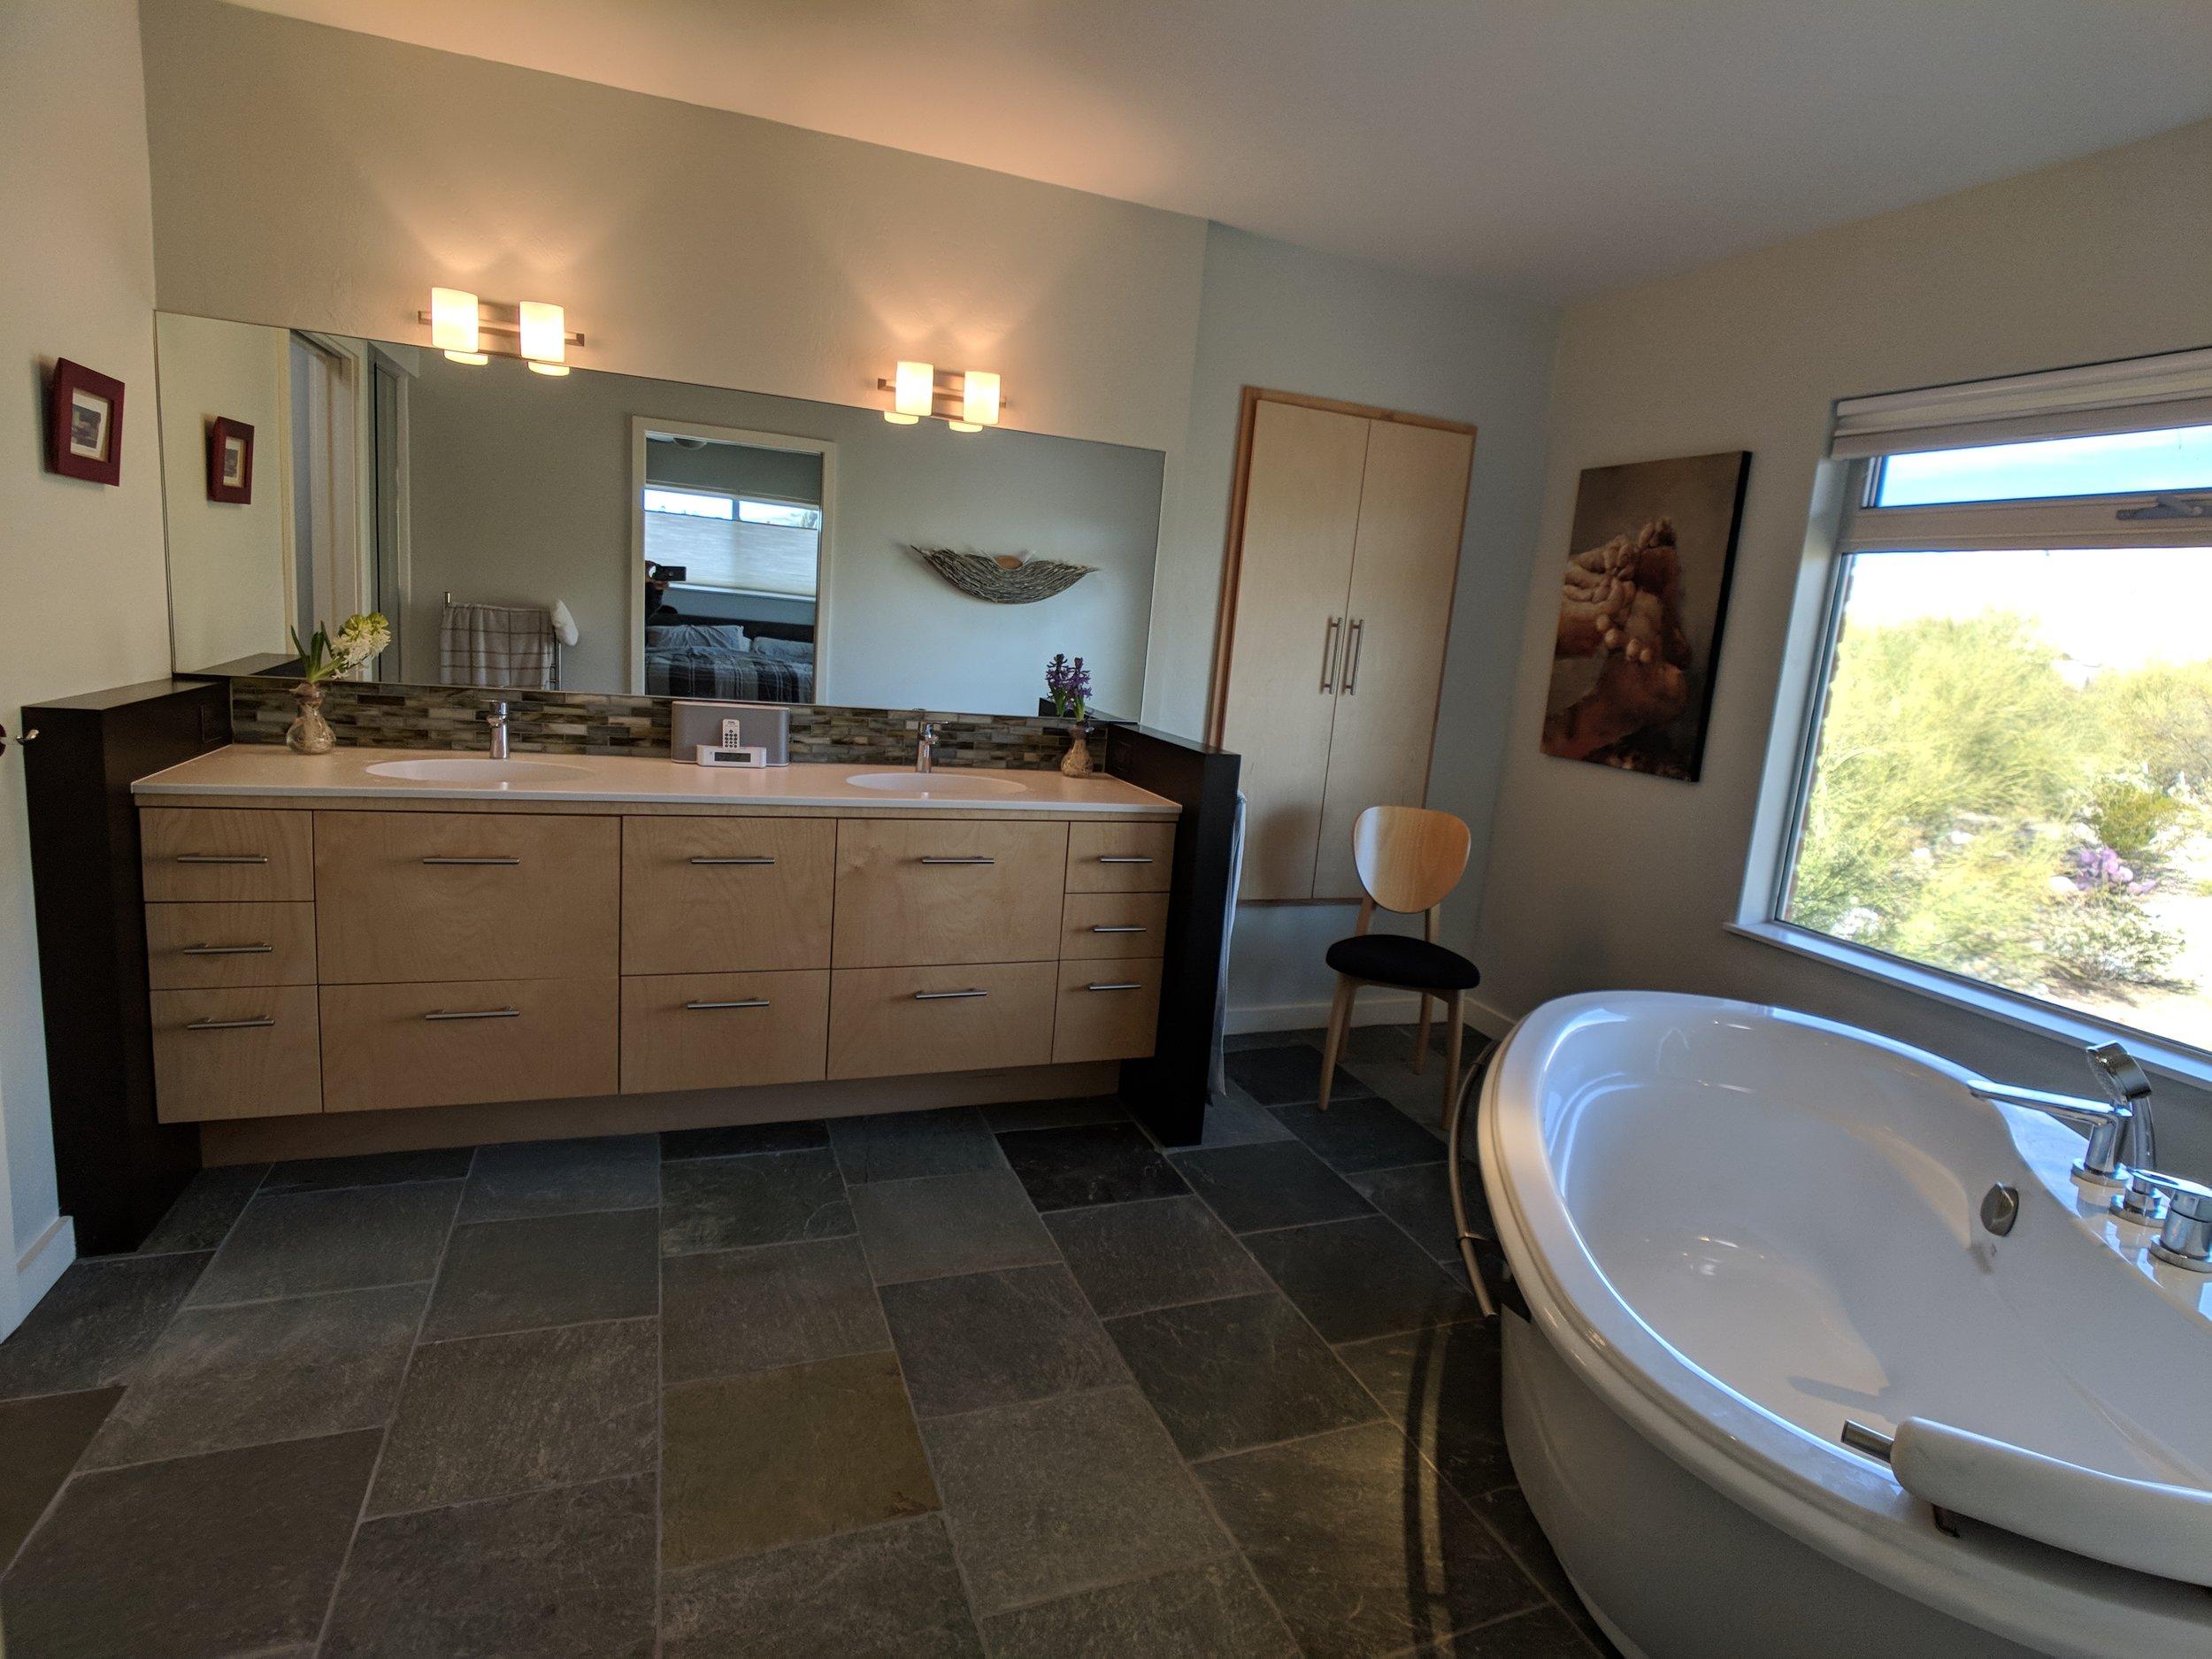 holland-bathroom-freestanding-tub.jpg